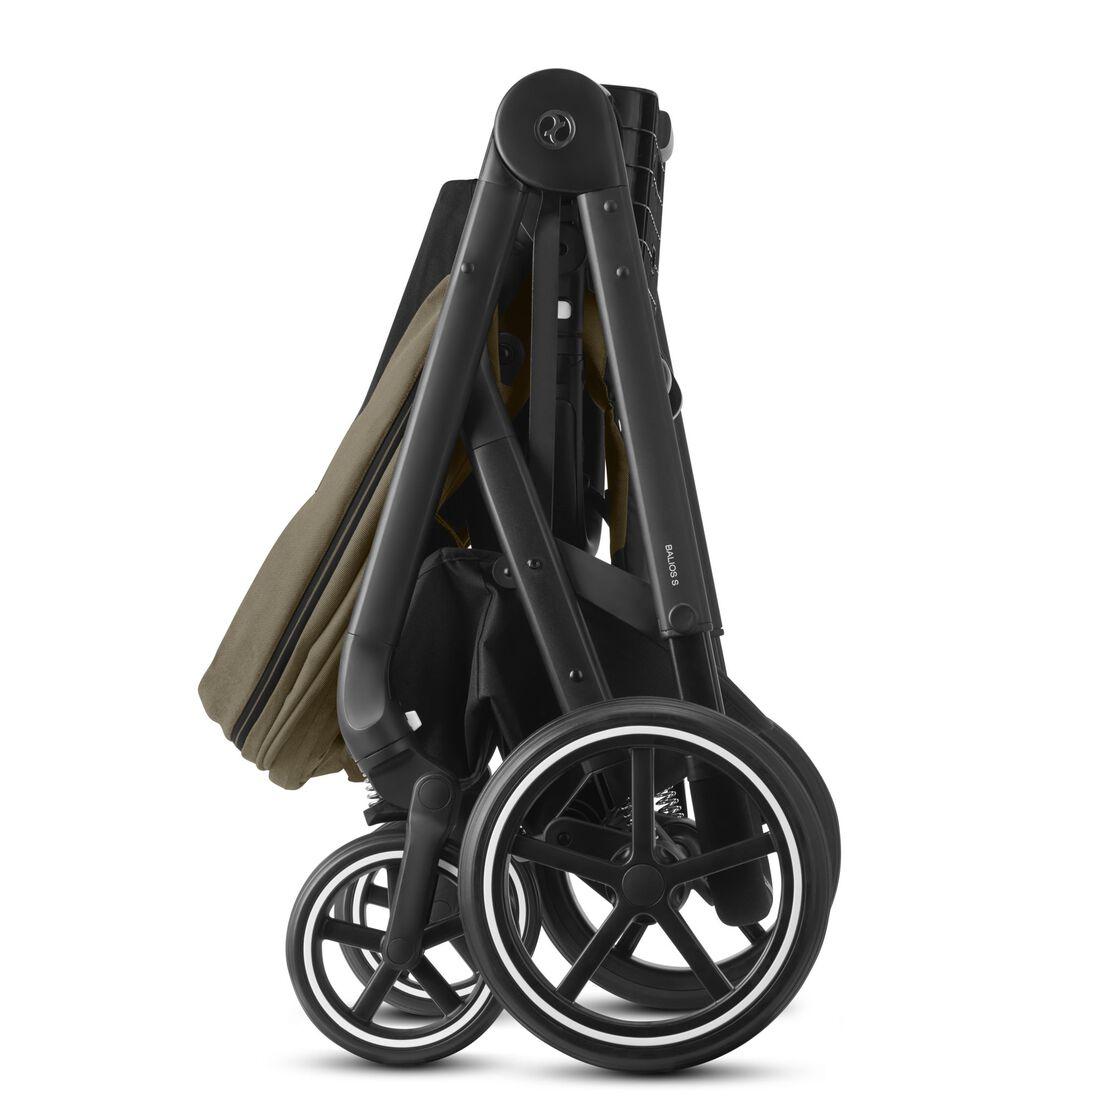 CYBEX Balios S Lux - Classic Beige (Black Frame) in Classic Beige (Black Frame) large image number 7